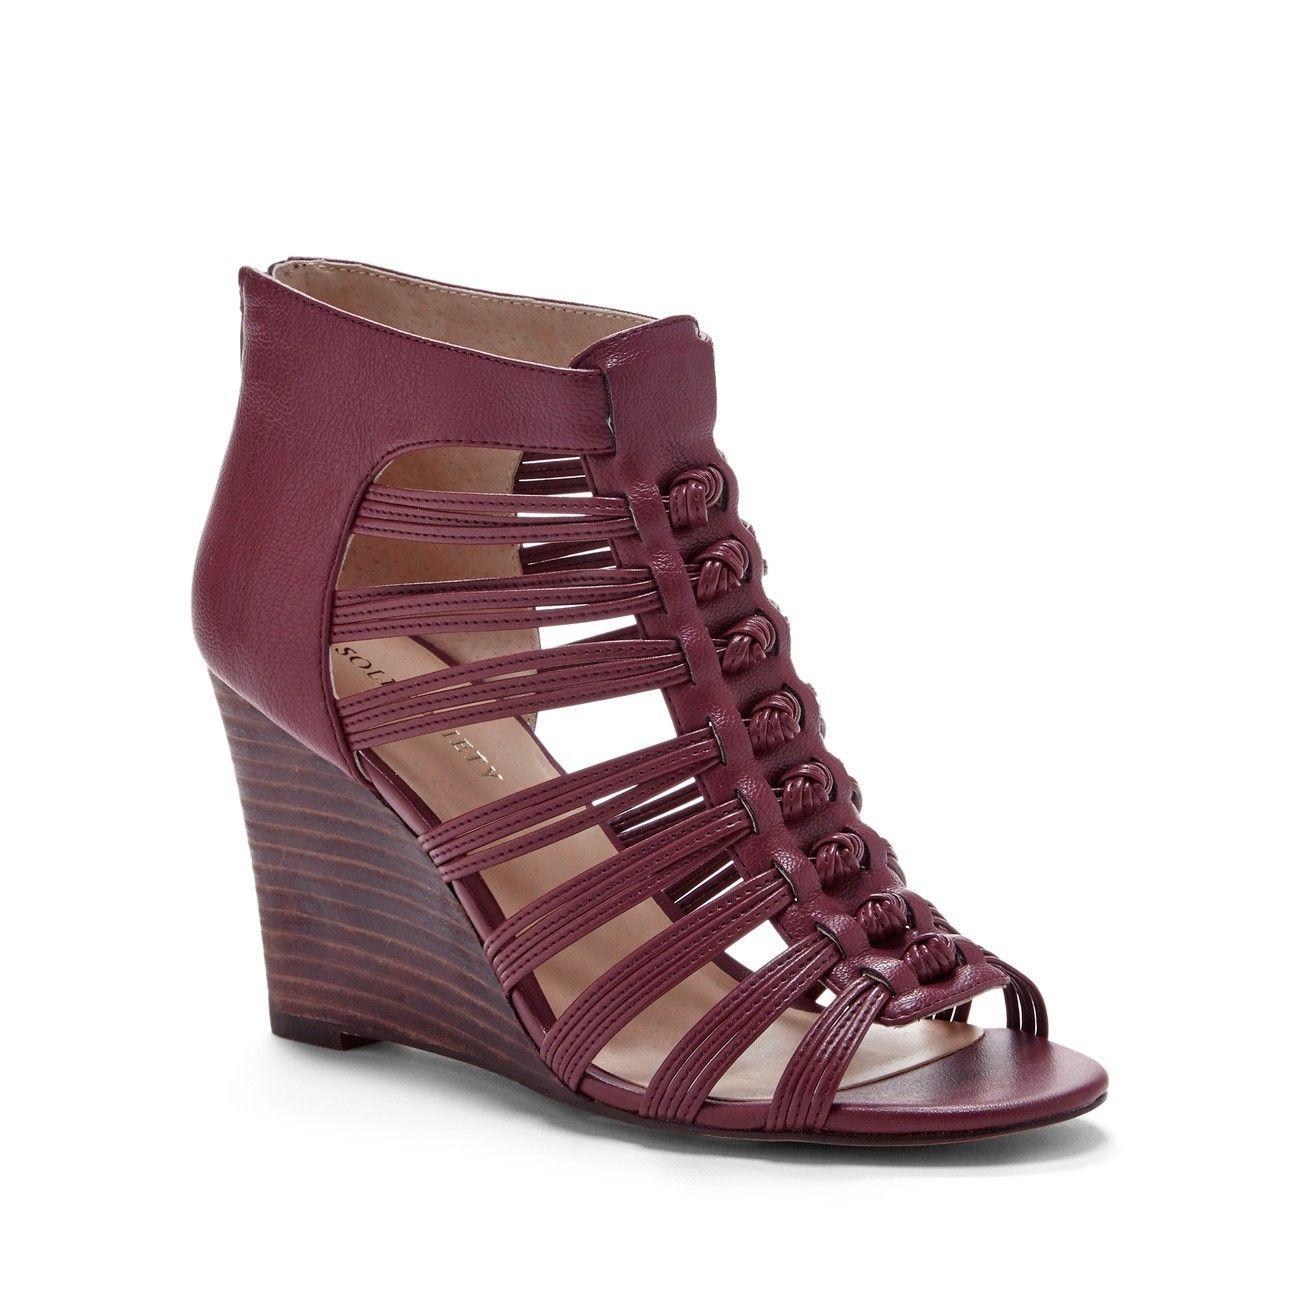 5a0e61ed2f7d Oxblood wedge sandals